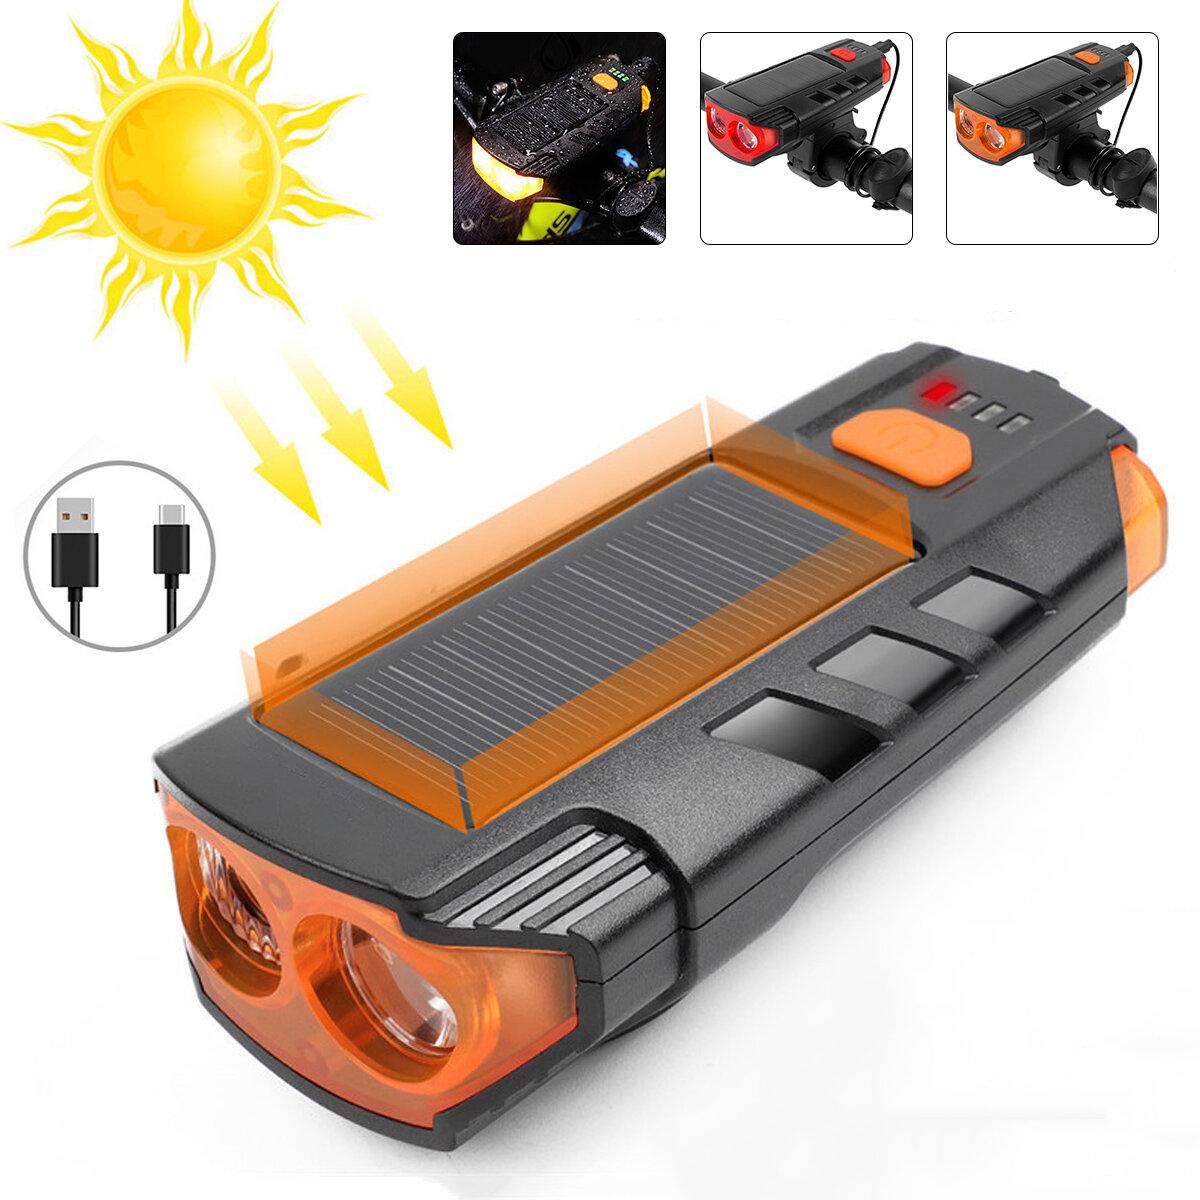 350LM 2xT6 LED Faro de bicicleta 5 modos Bicicleta Solar Luz frontal 6 modos 120 dB Bocina USB recargable Impermeable Li